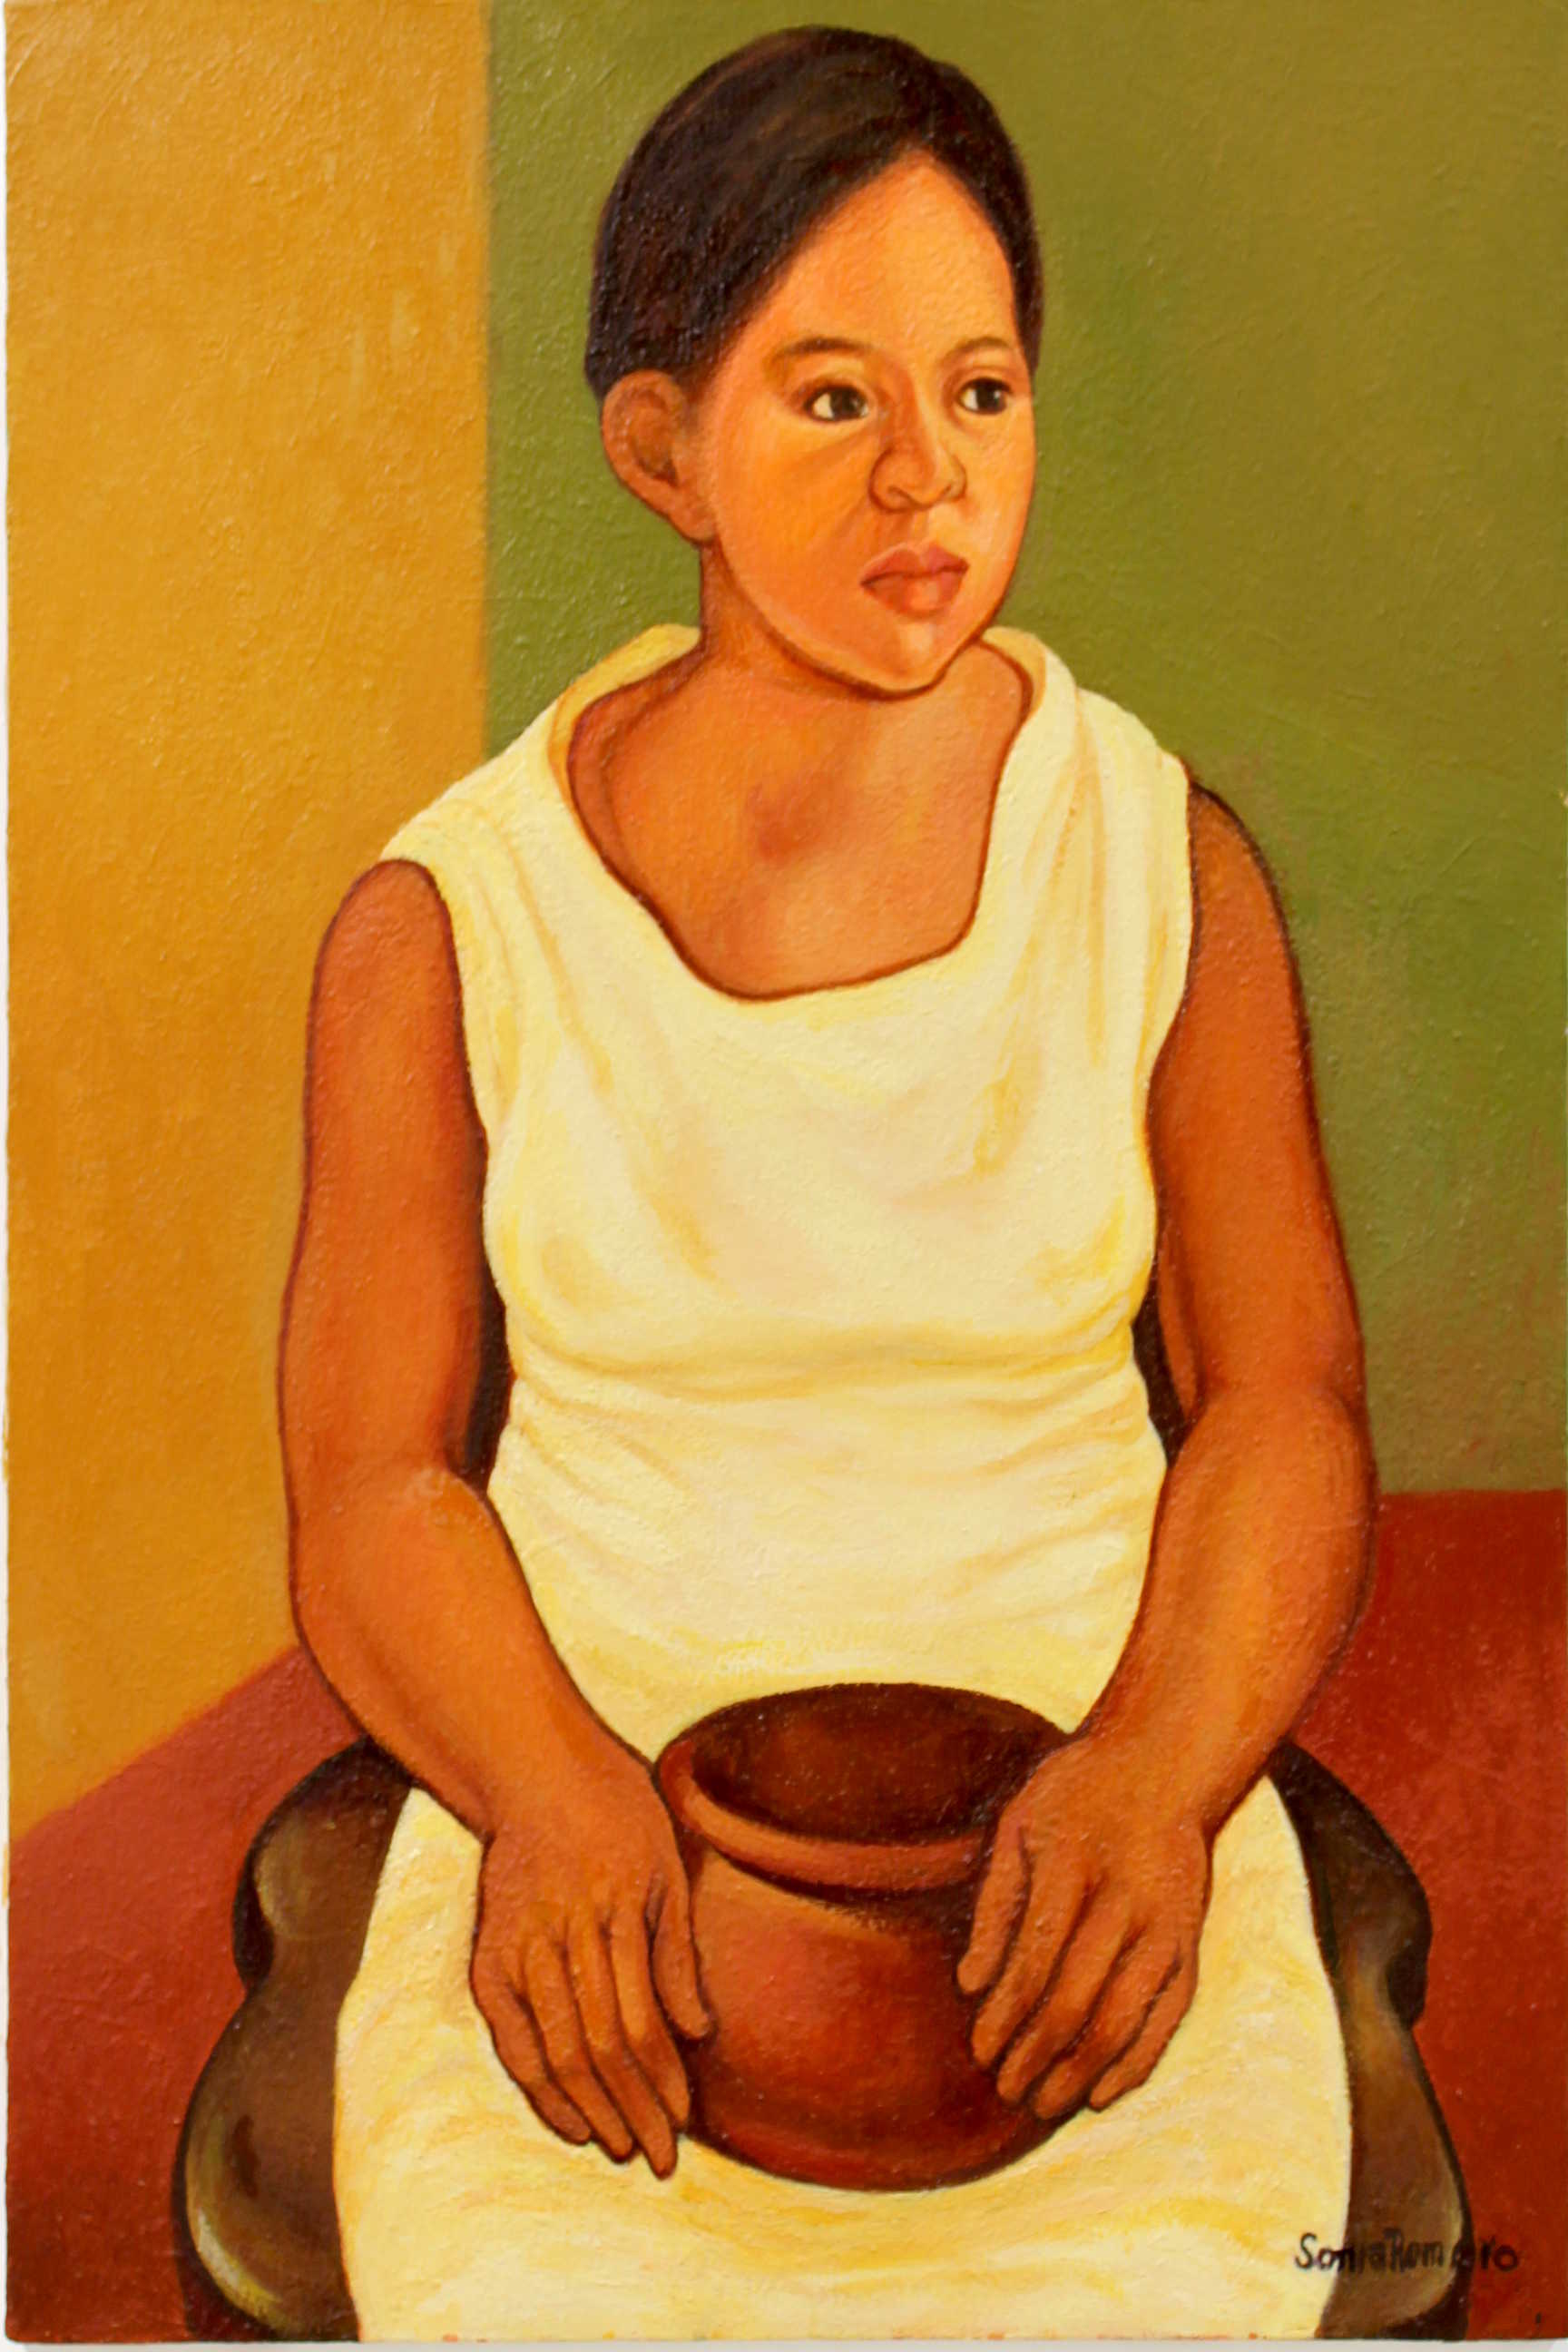 Obra de Sonia Romero Carmona, retrato de Paulita, óleo, Año 2017. Fotografía: Adriana Araya.